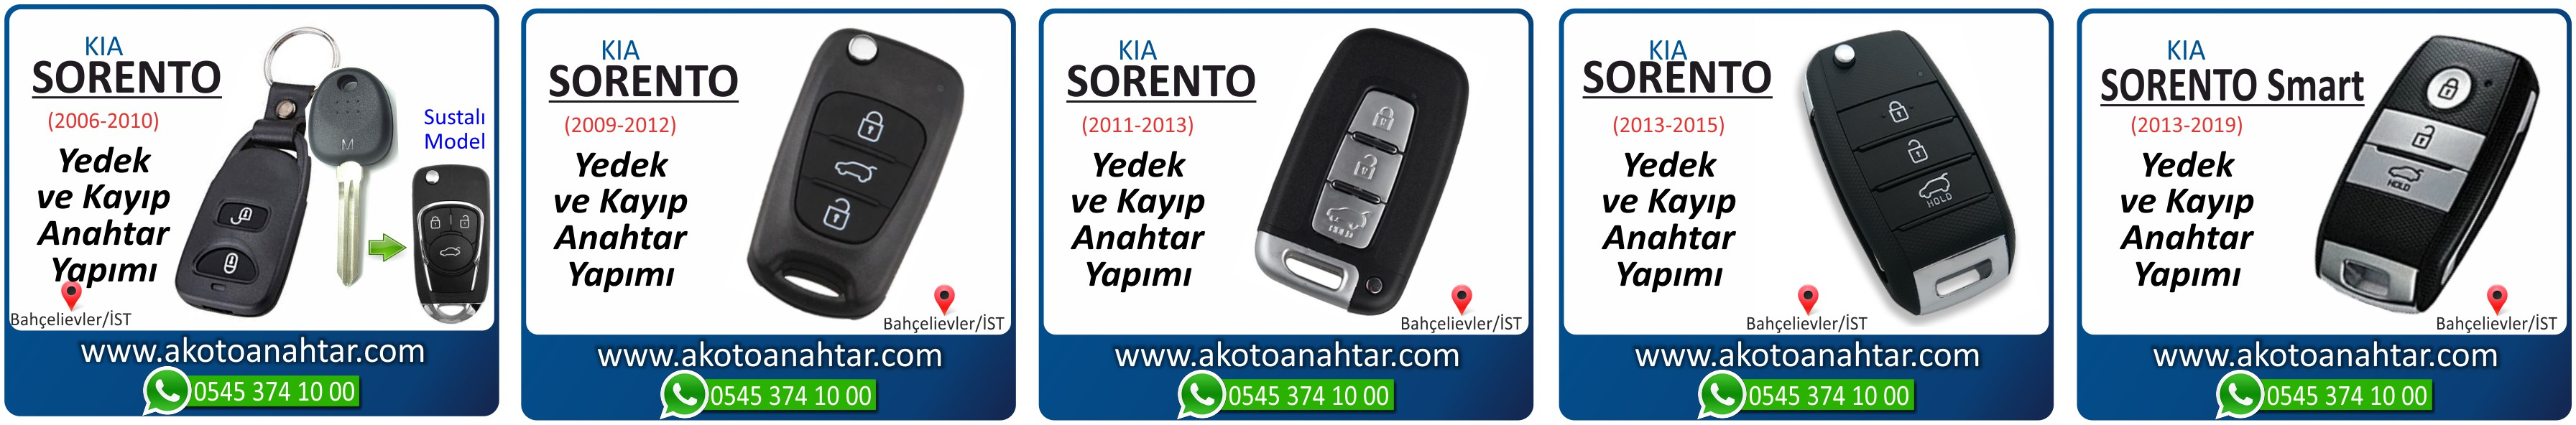 kia sorrento anahtari - Kia Sorento Sustalı Anahtarı | Yedek ve Kayıp Anahtar Yapımı